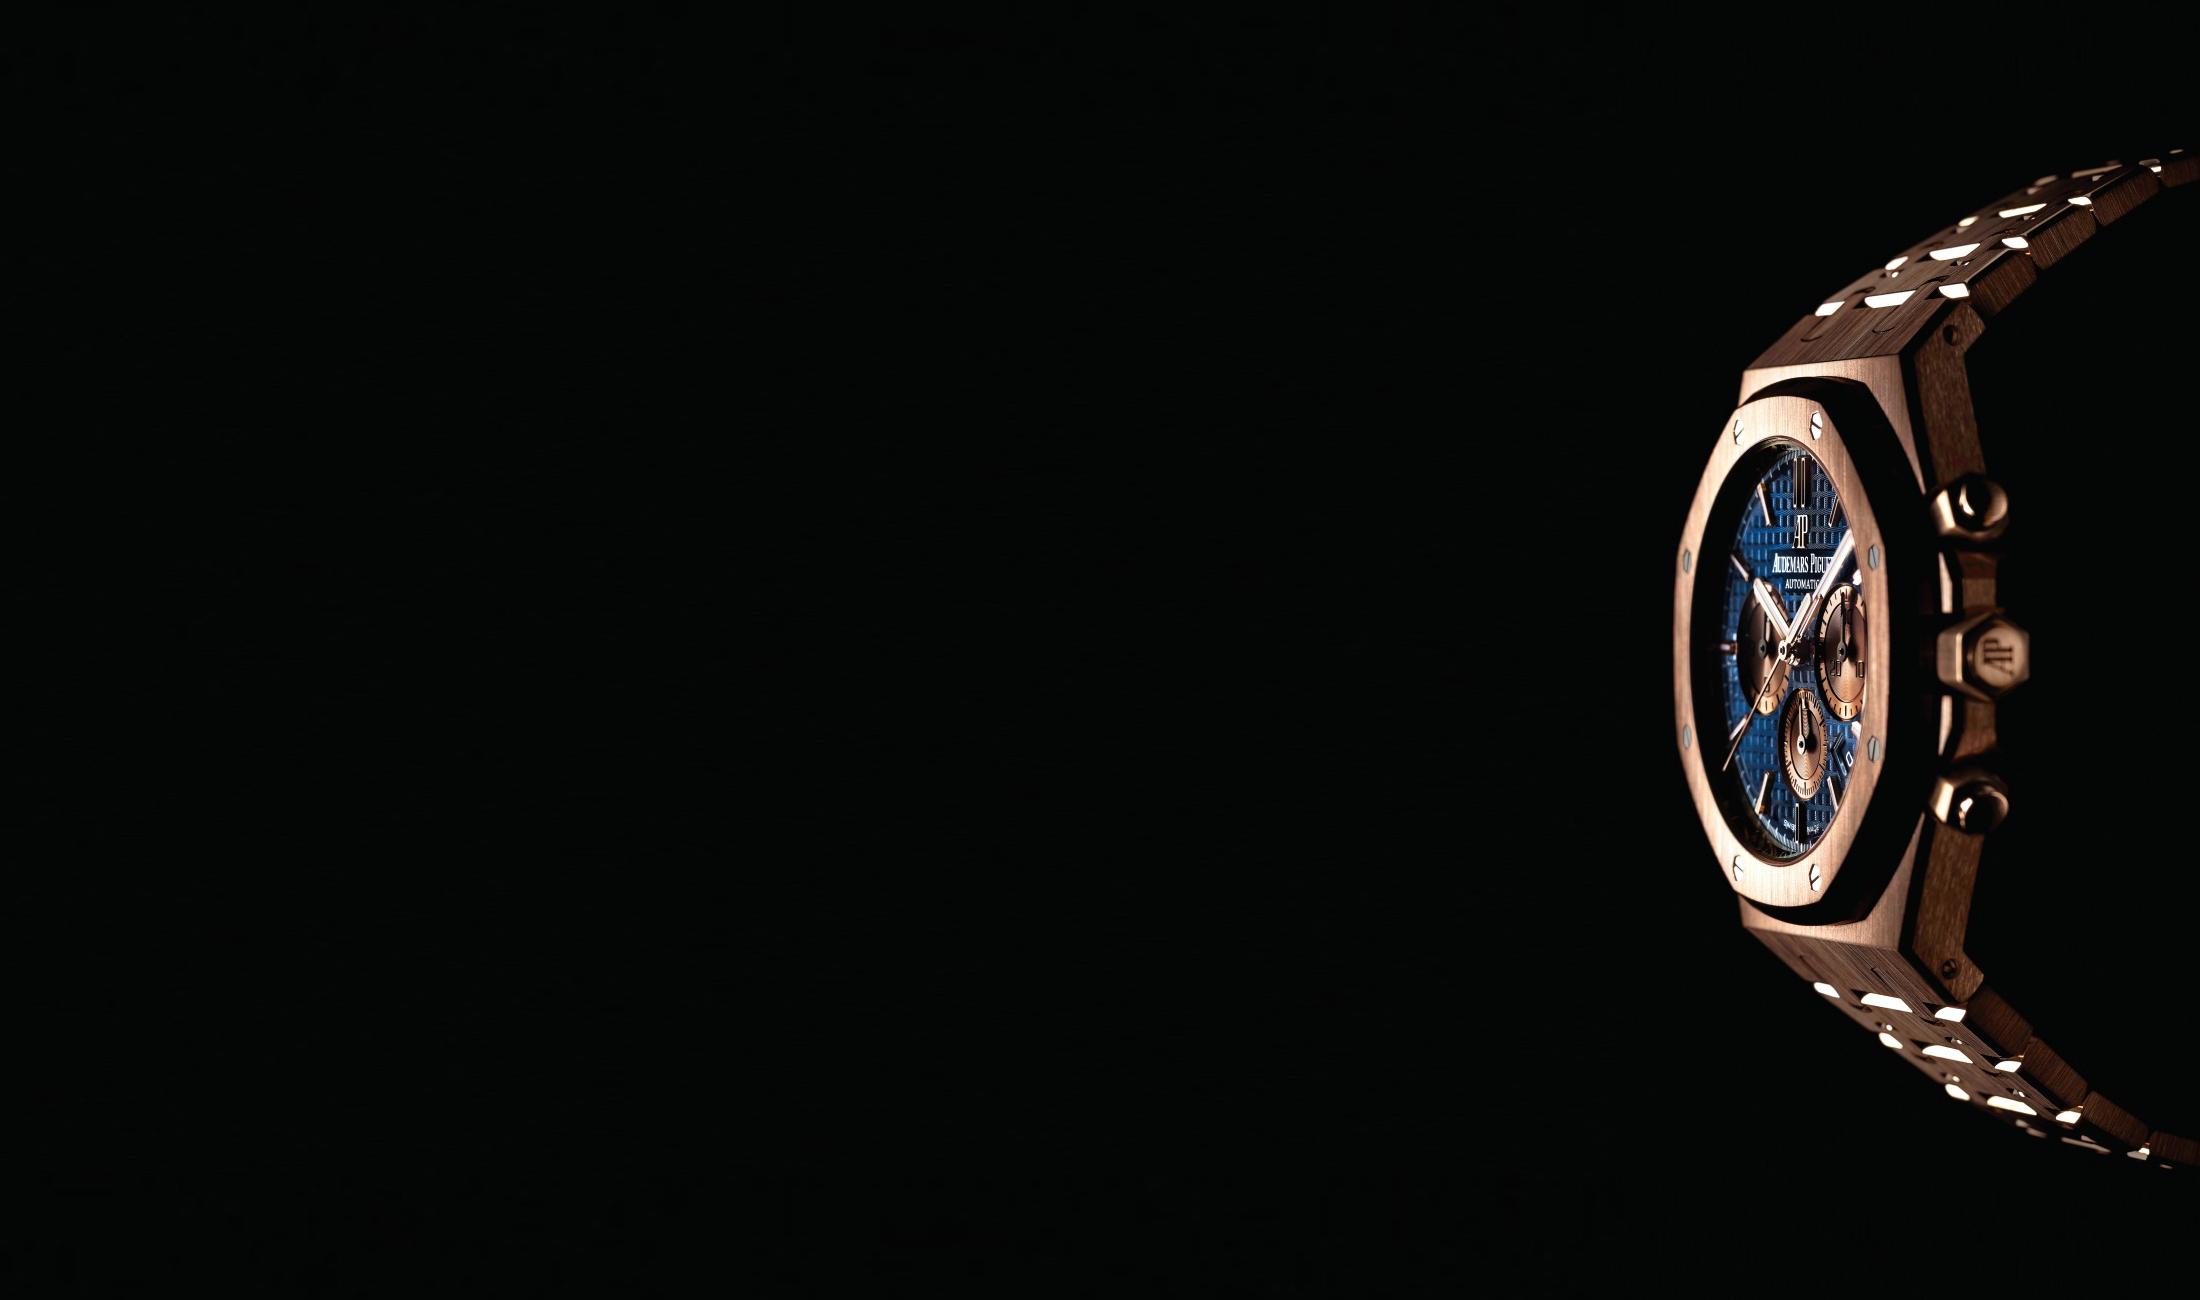 Audermars Piguet Uhren bei Rüschenbeck